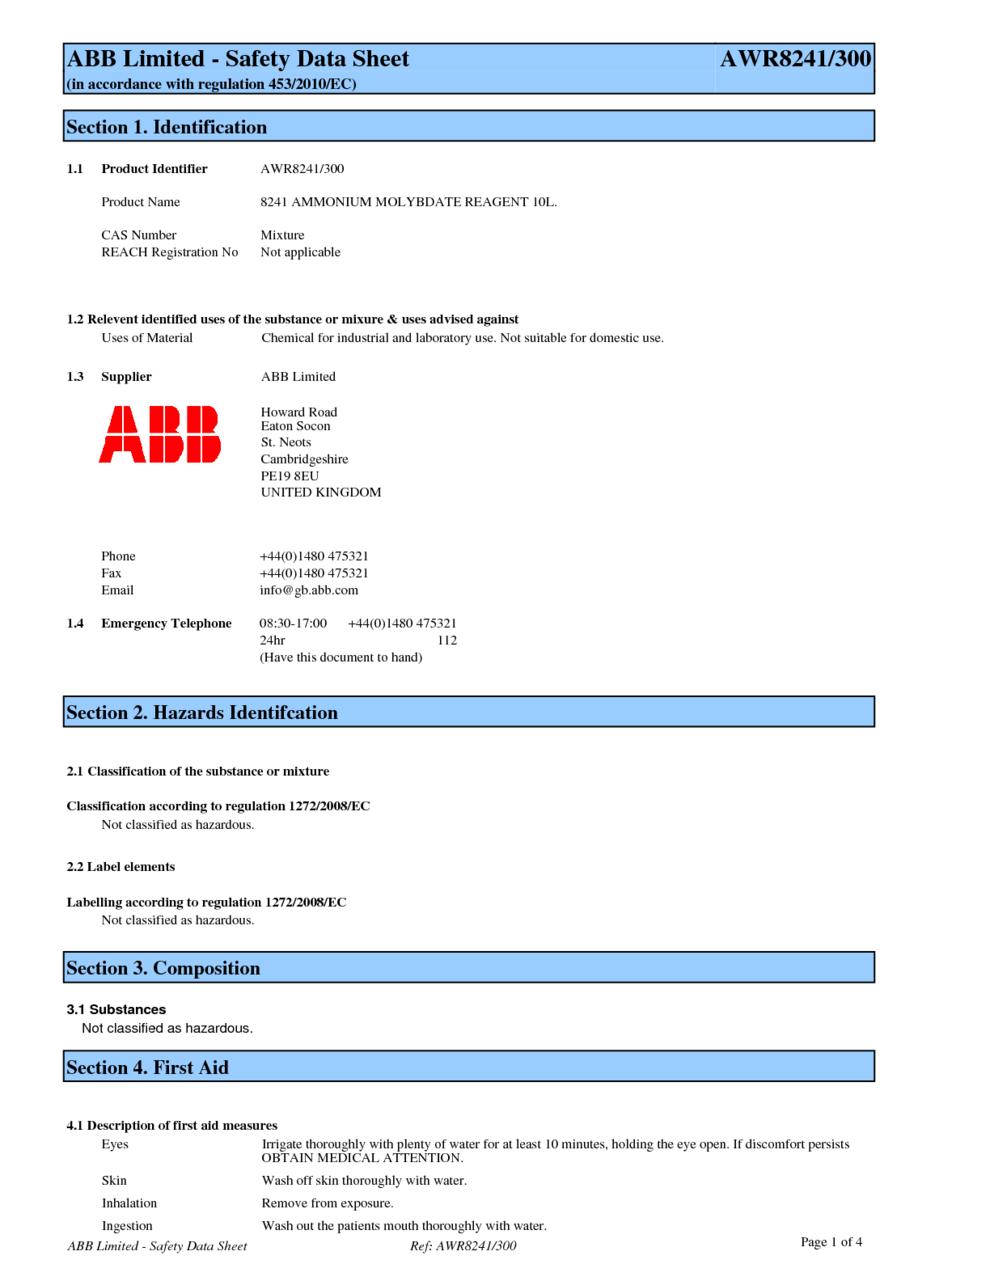 8241 Ammonium Molybdate Reagent 10l Msds Download